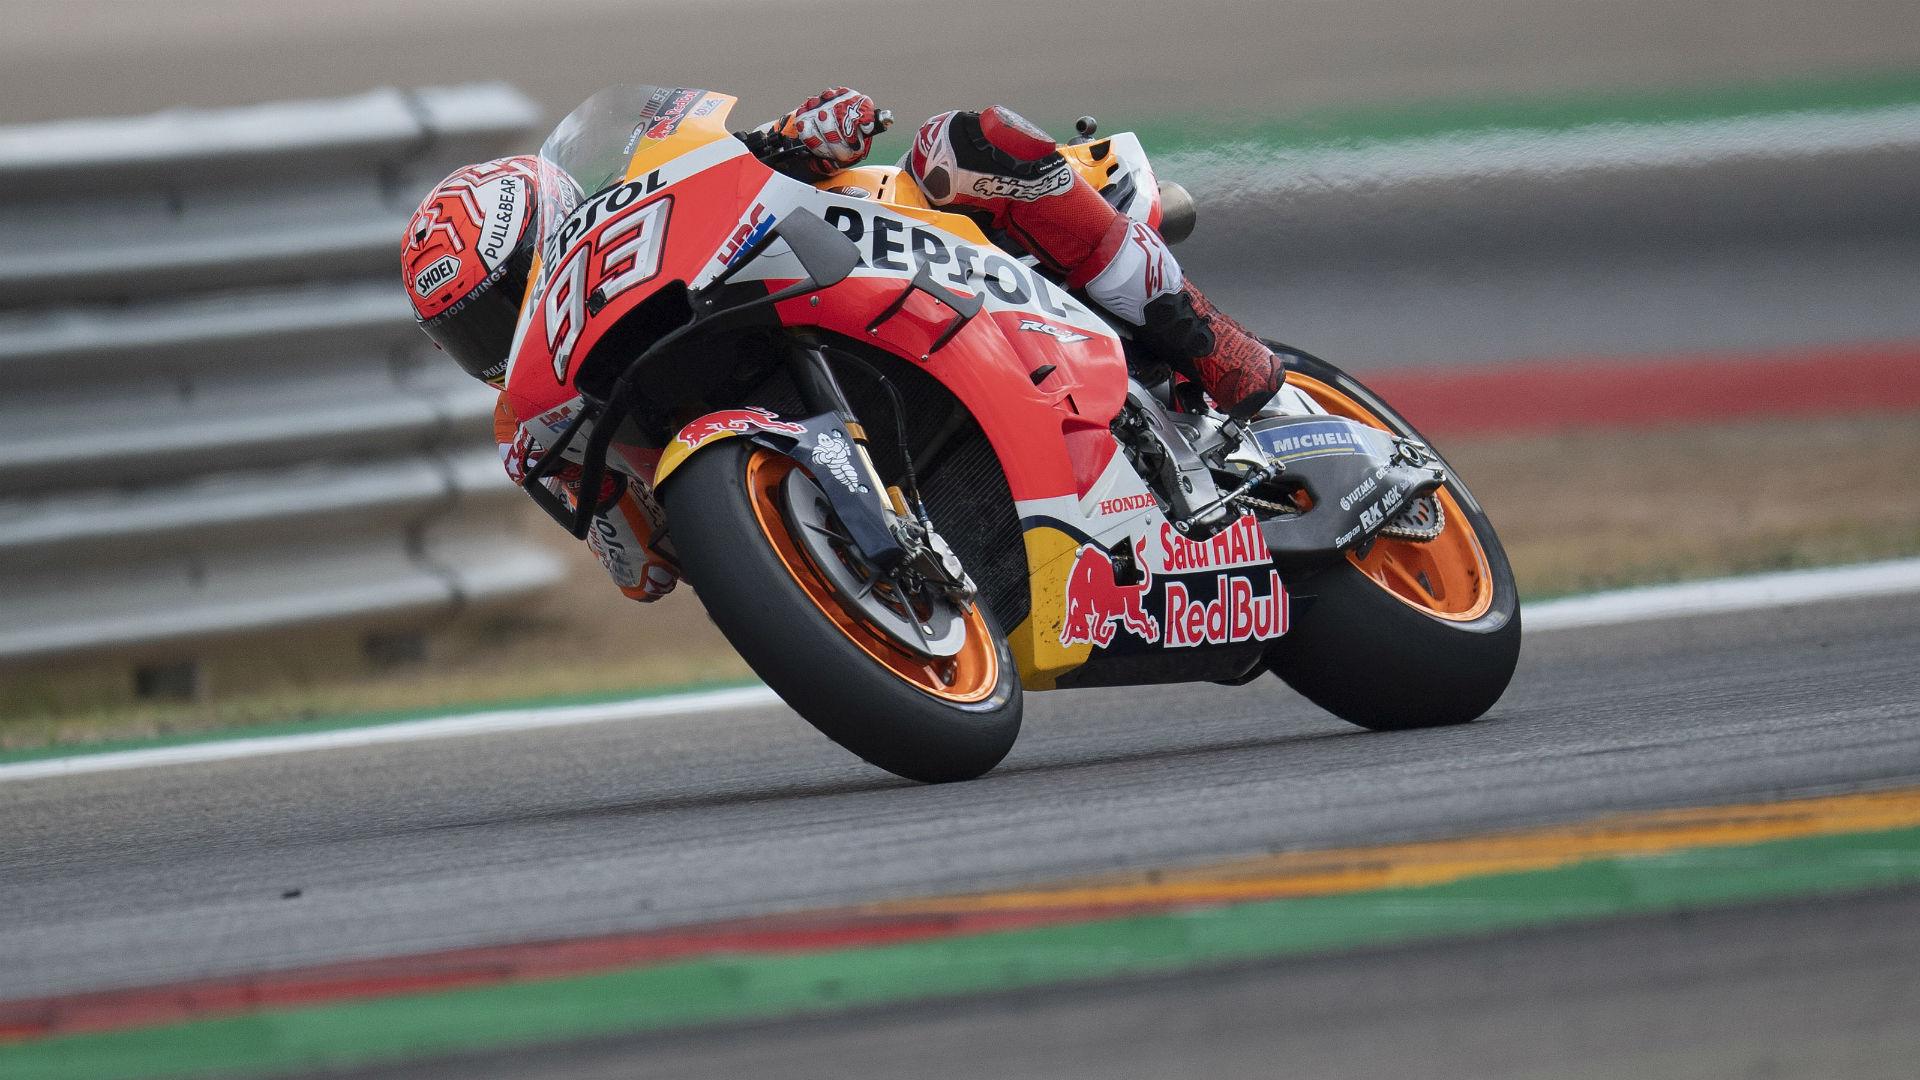 MotoGP raceweek: Dominant Marquez eyes sixth title - Thailand Grand Prix in numbers